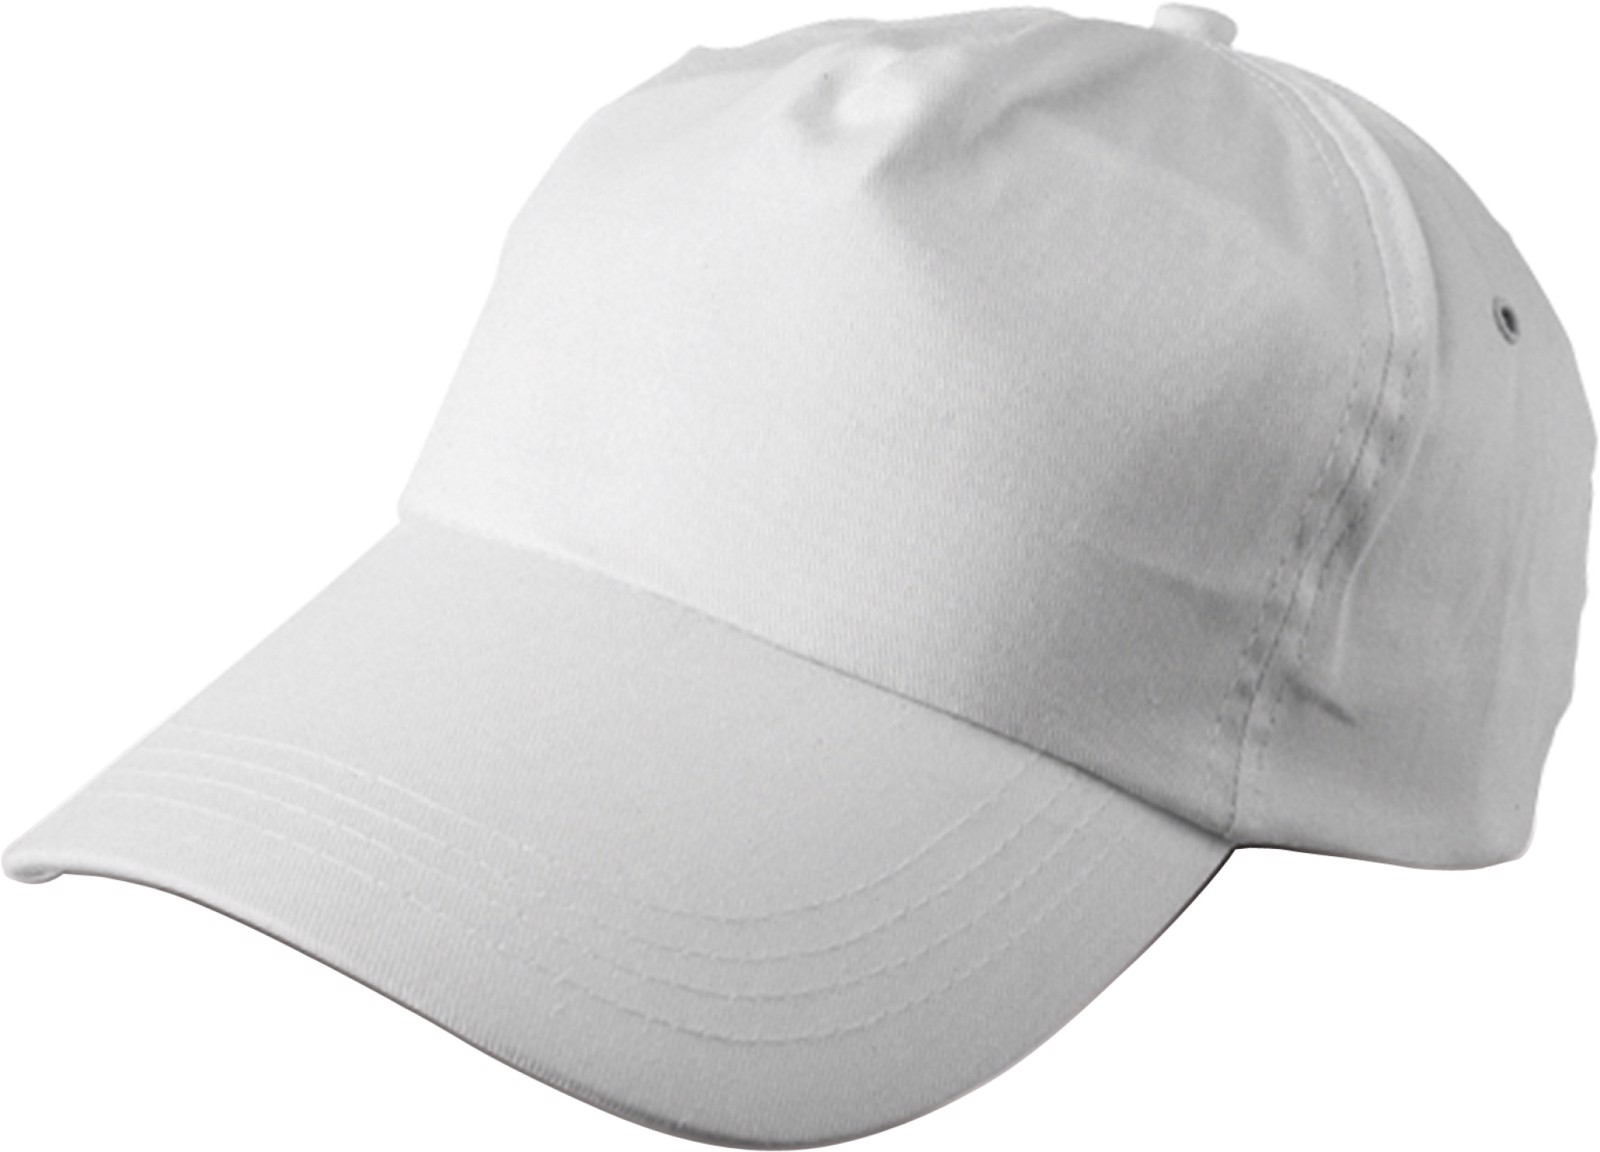 Cotton twill cap - White